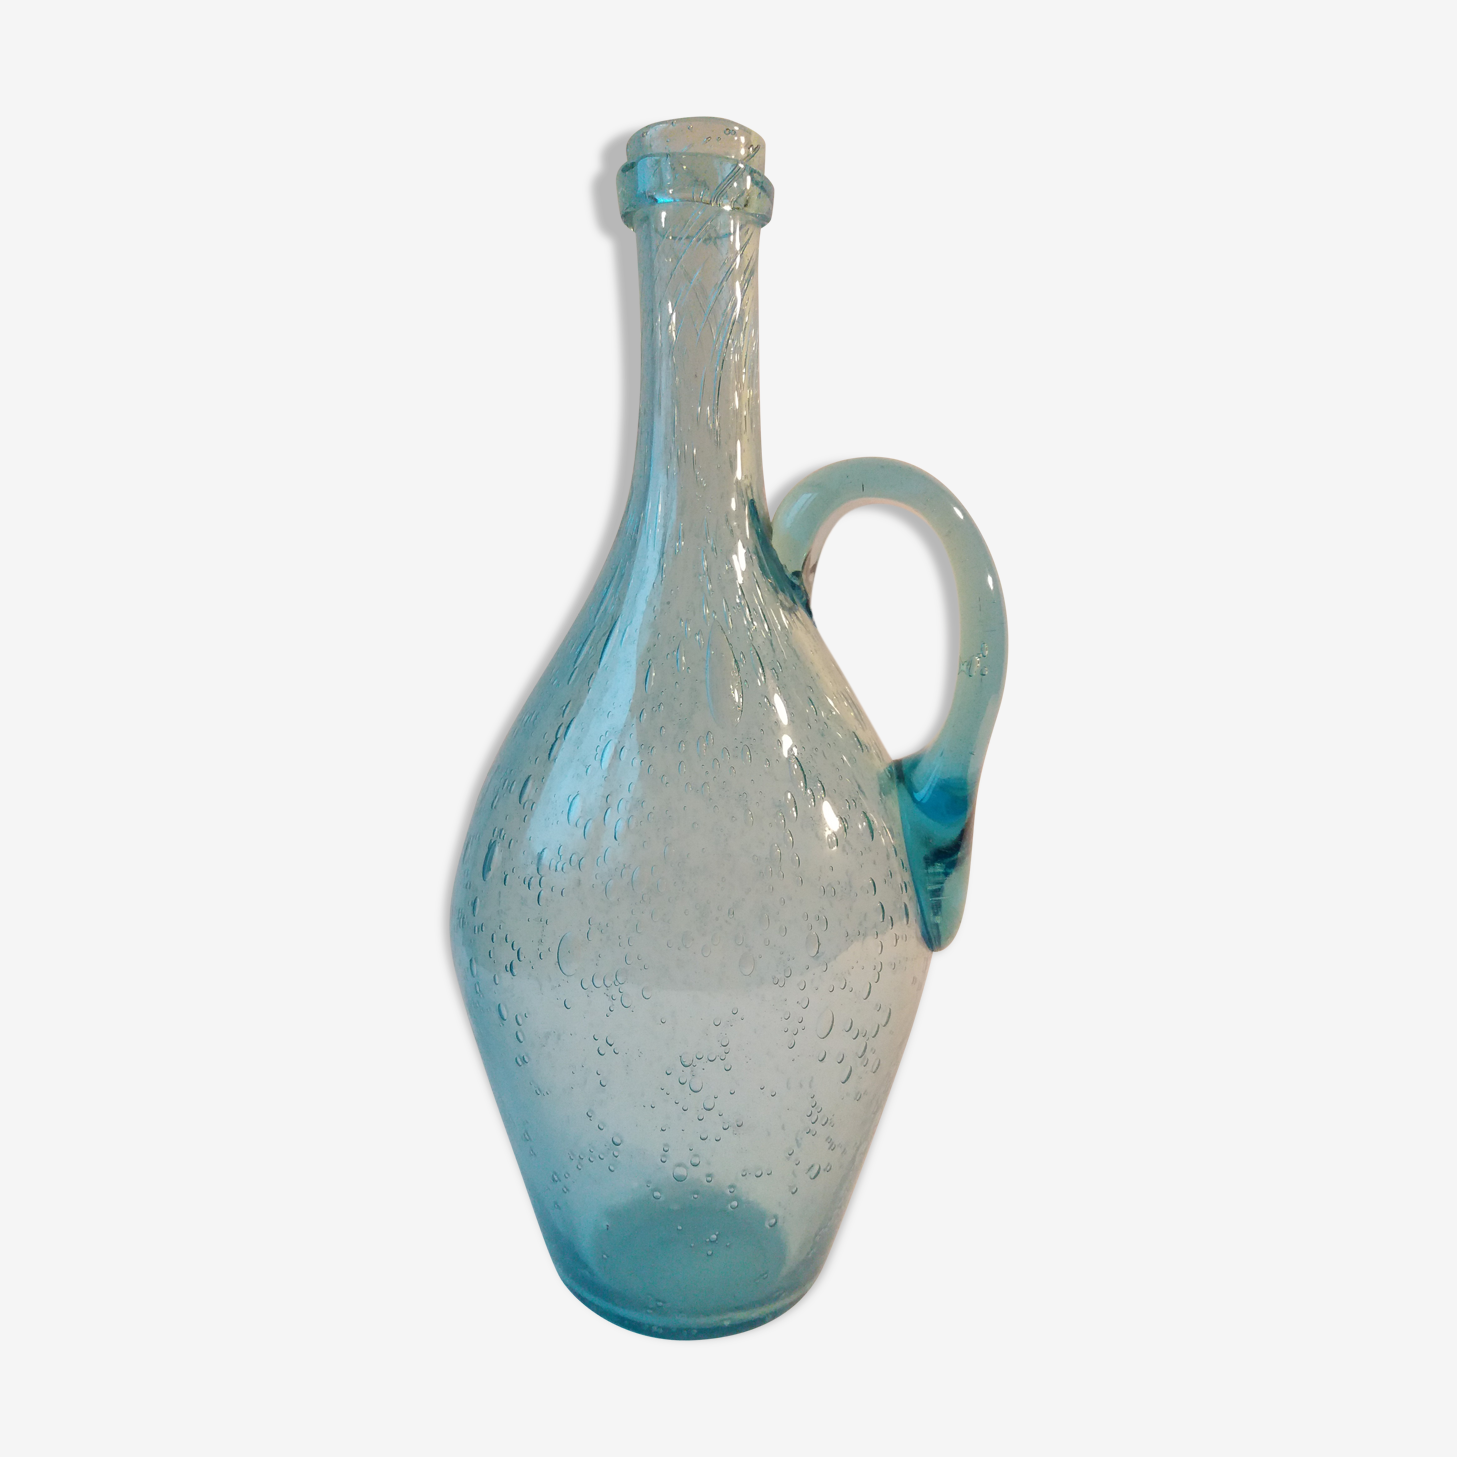 Blue Biot glass carafe